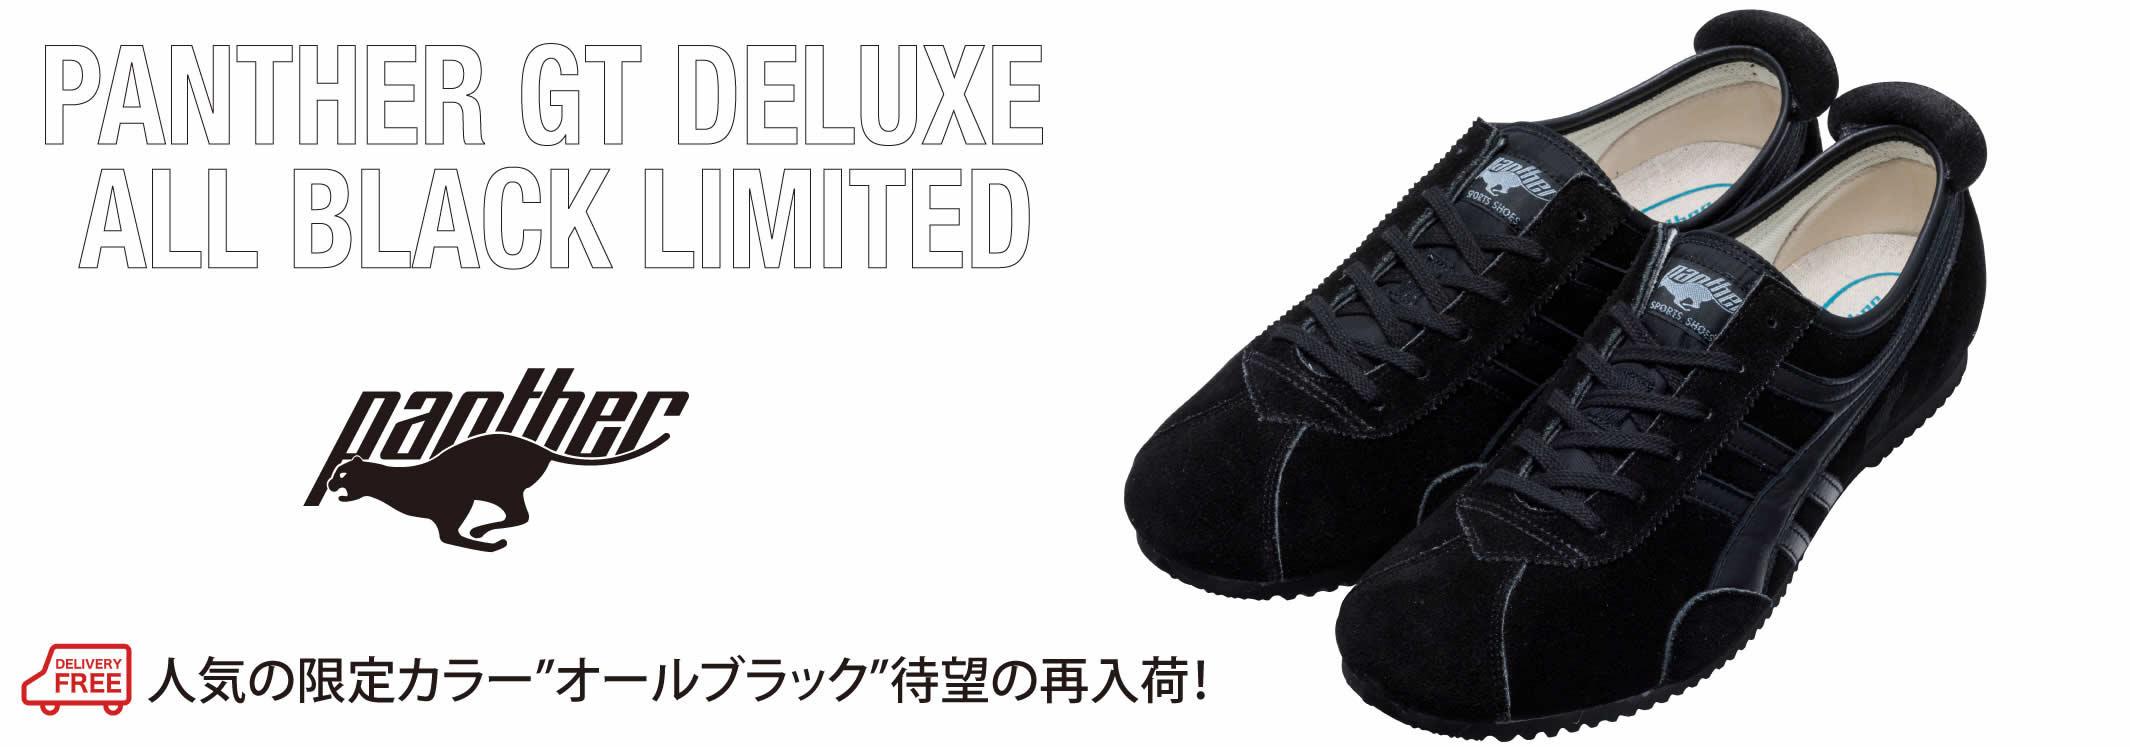 15-mv02-all_black